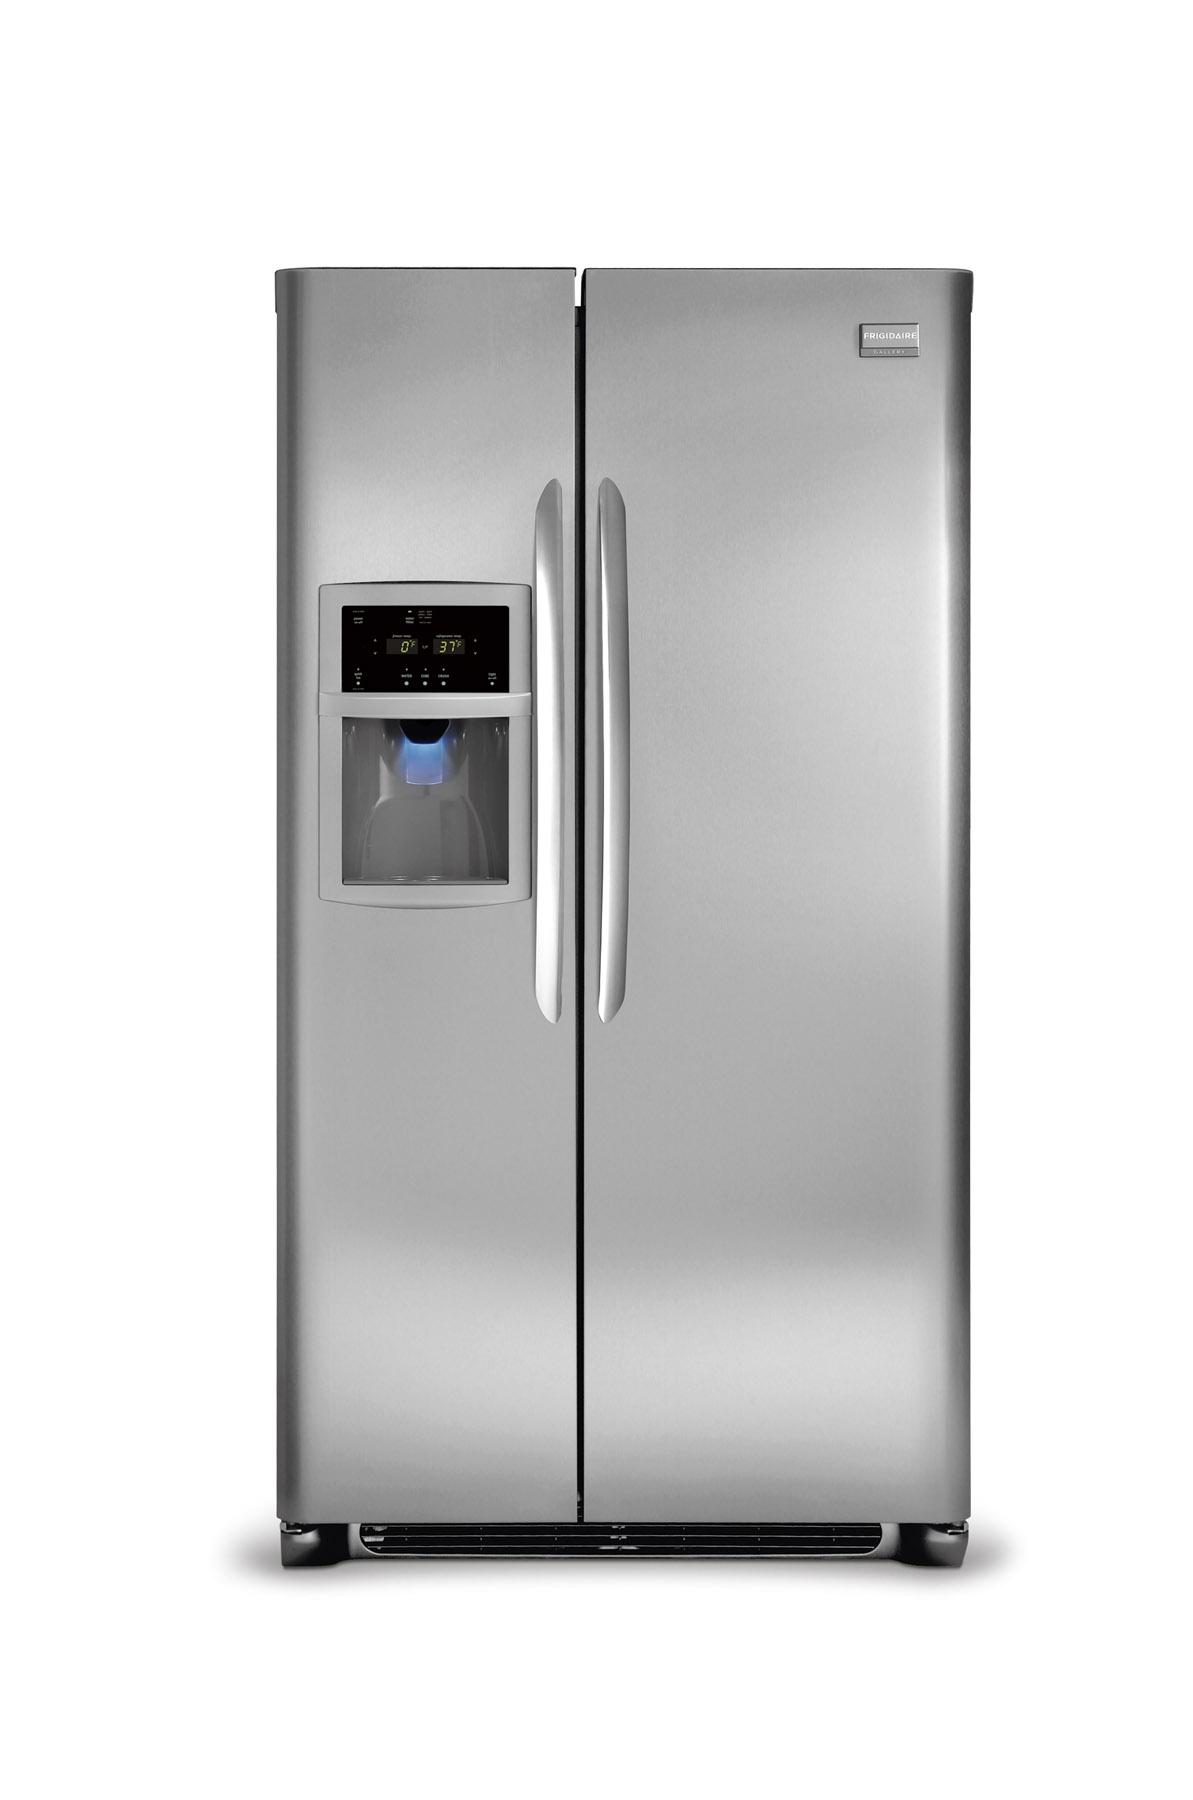 Frigidaire Refrigerator Model FGHS2644KF1 Parts